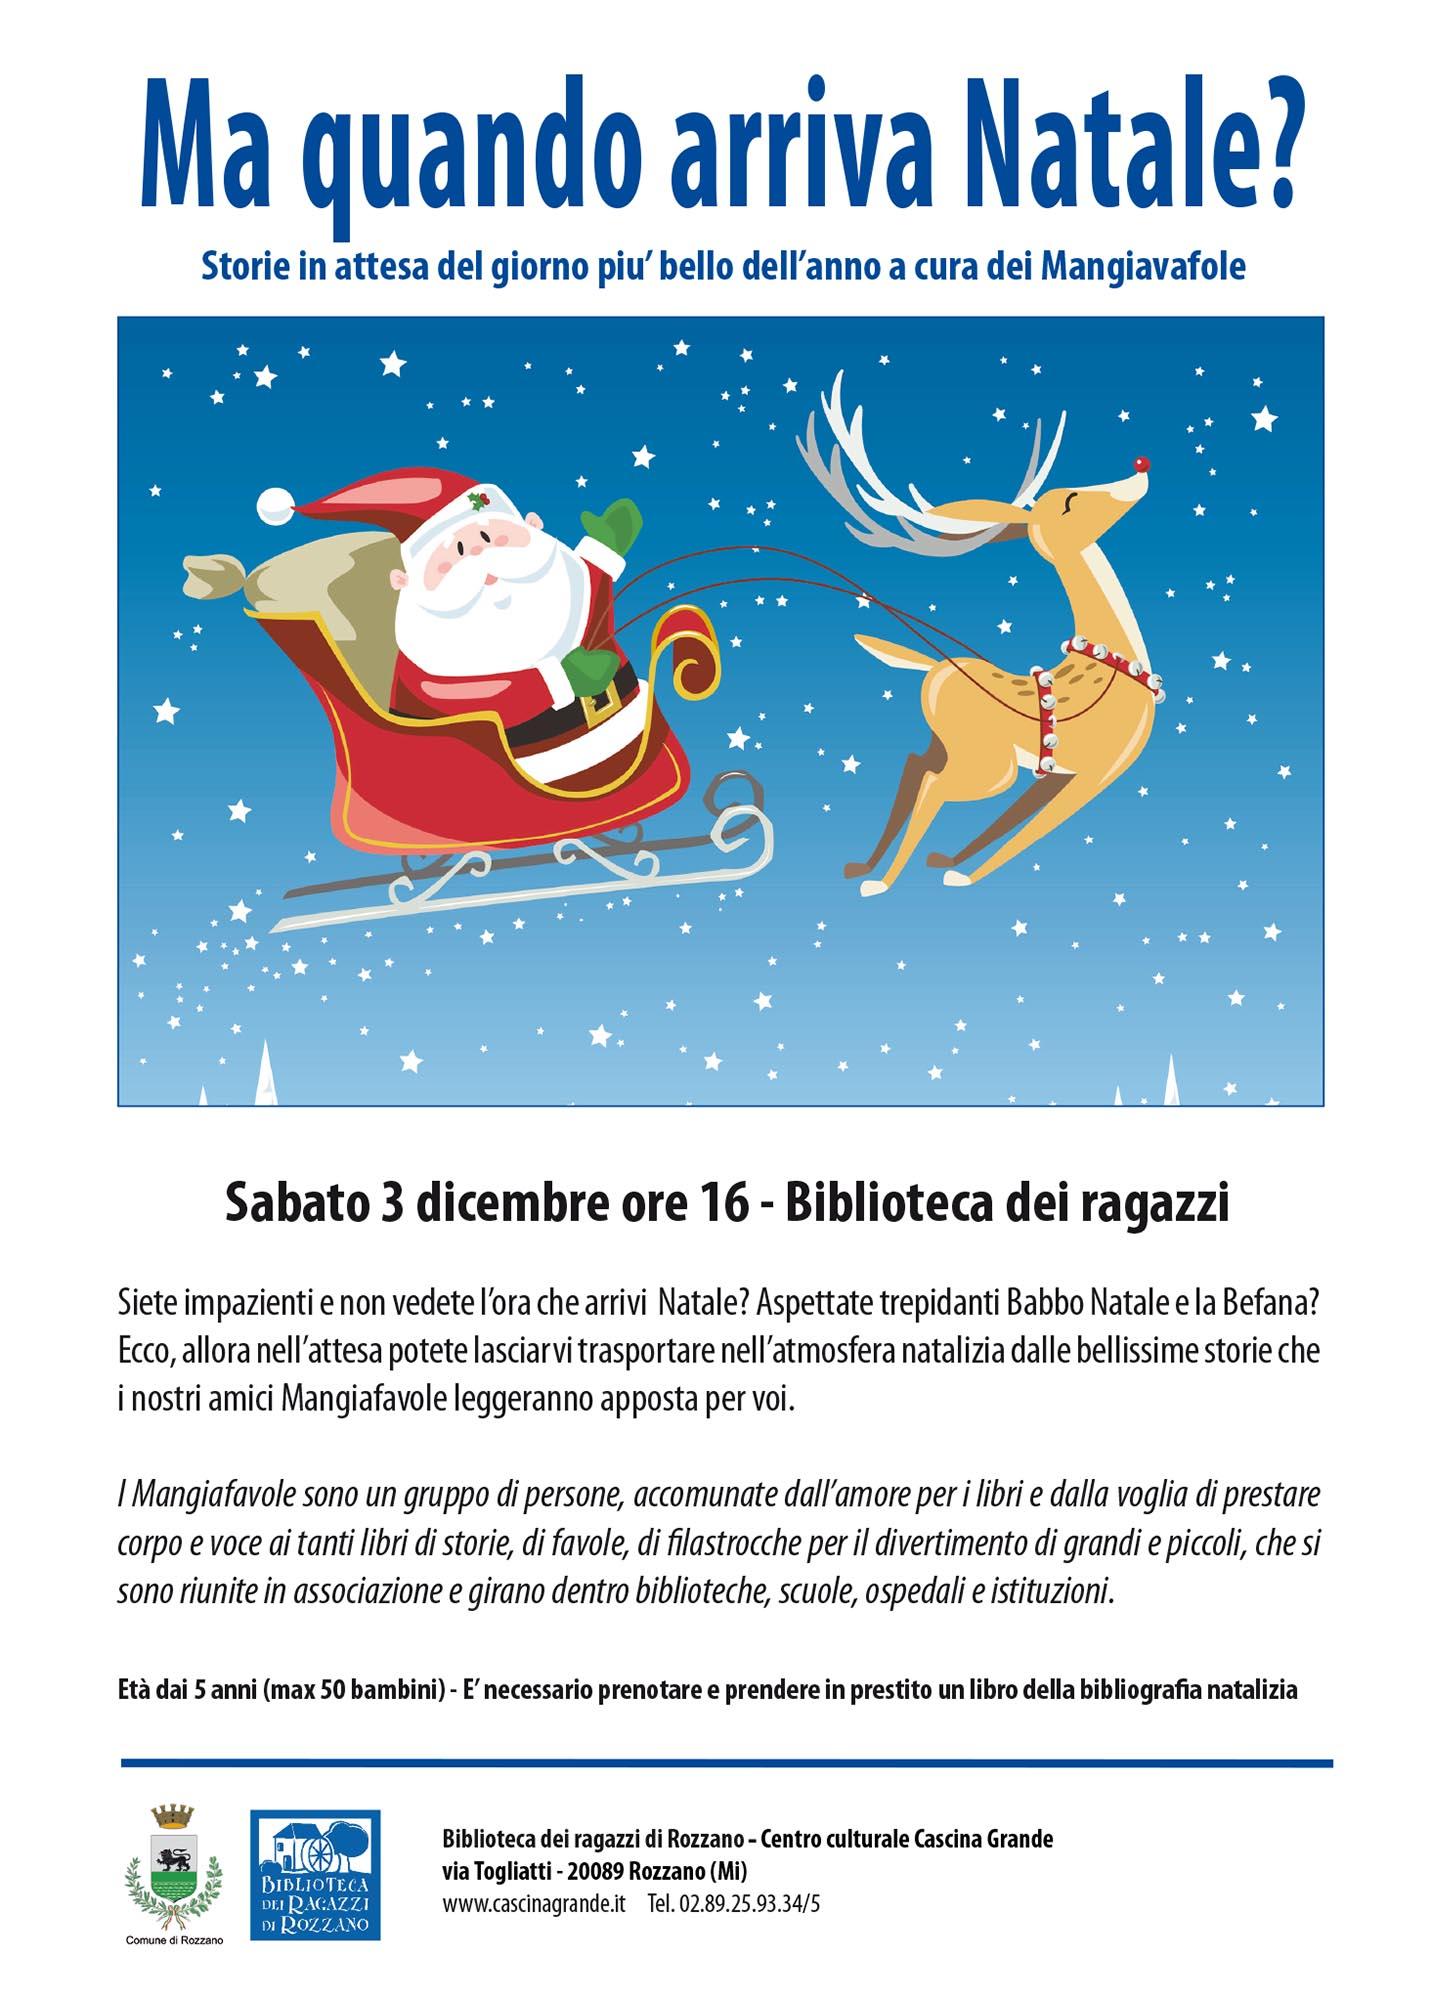 3.12.2016 I Mangiafavole presentano: Ma quando arriva Natale?